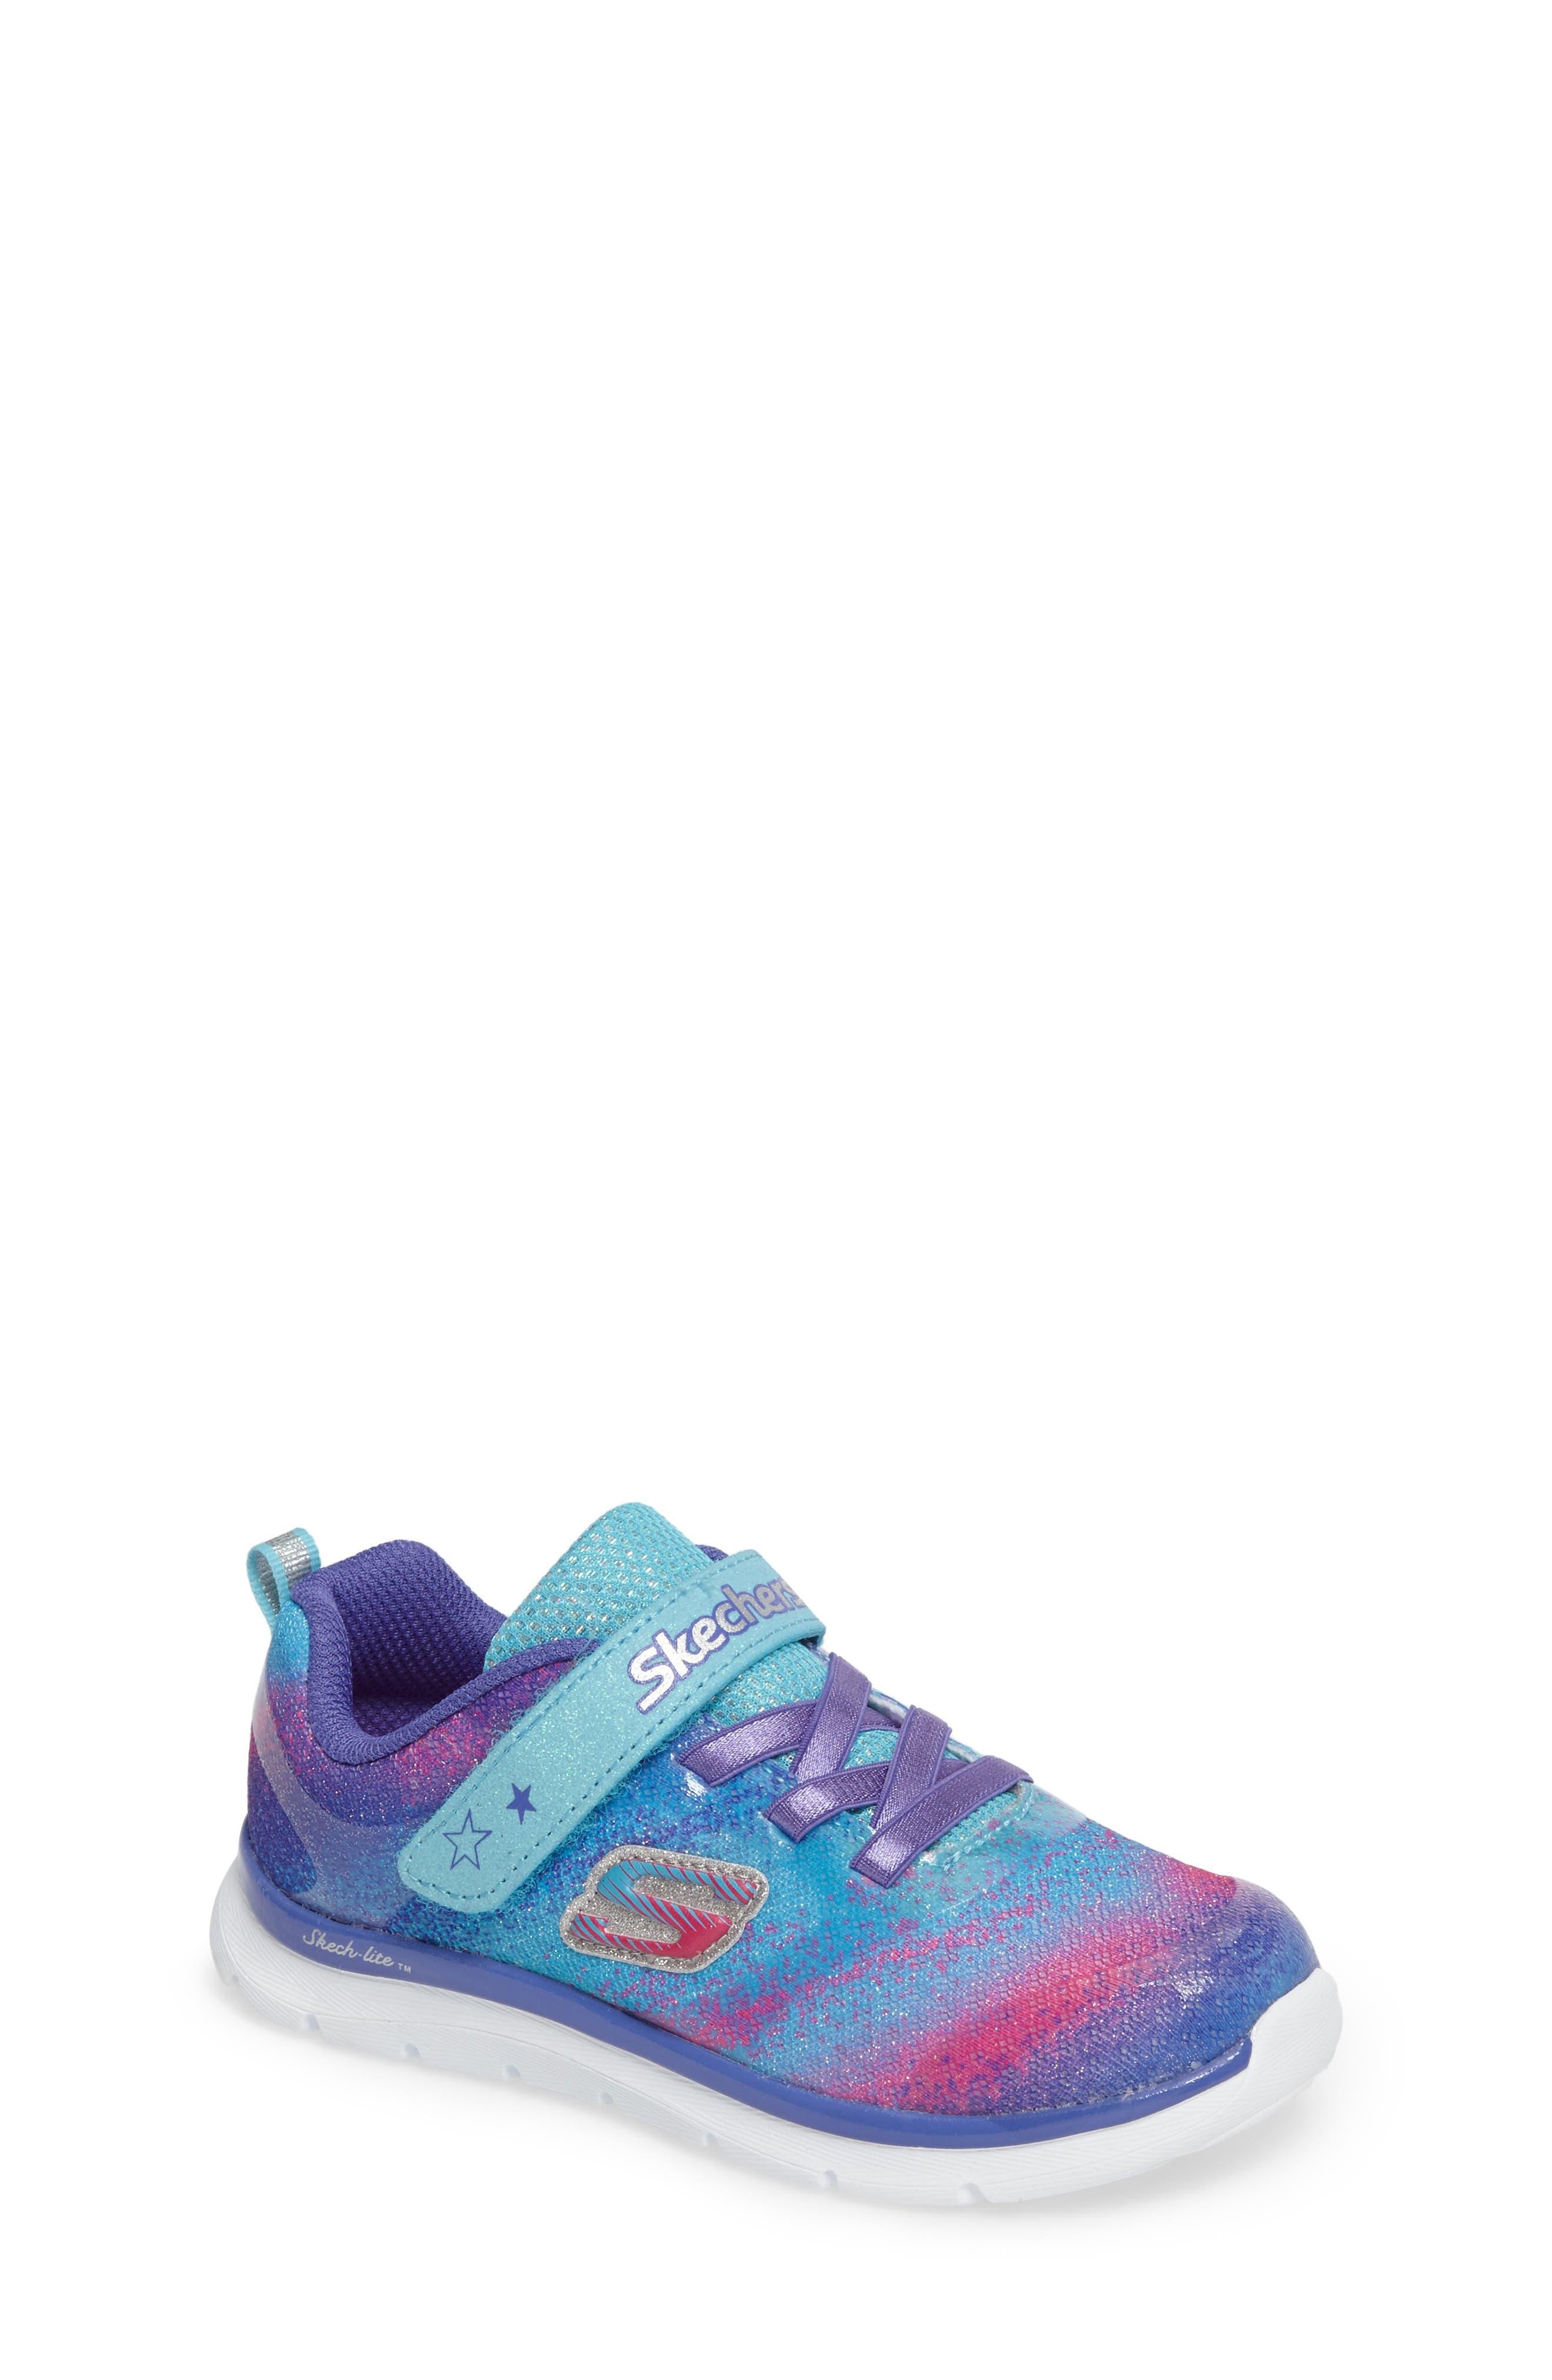 Skech-Lite Colorful Cutie Sneaker,                             Main thumbnail 1, color,